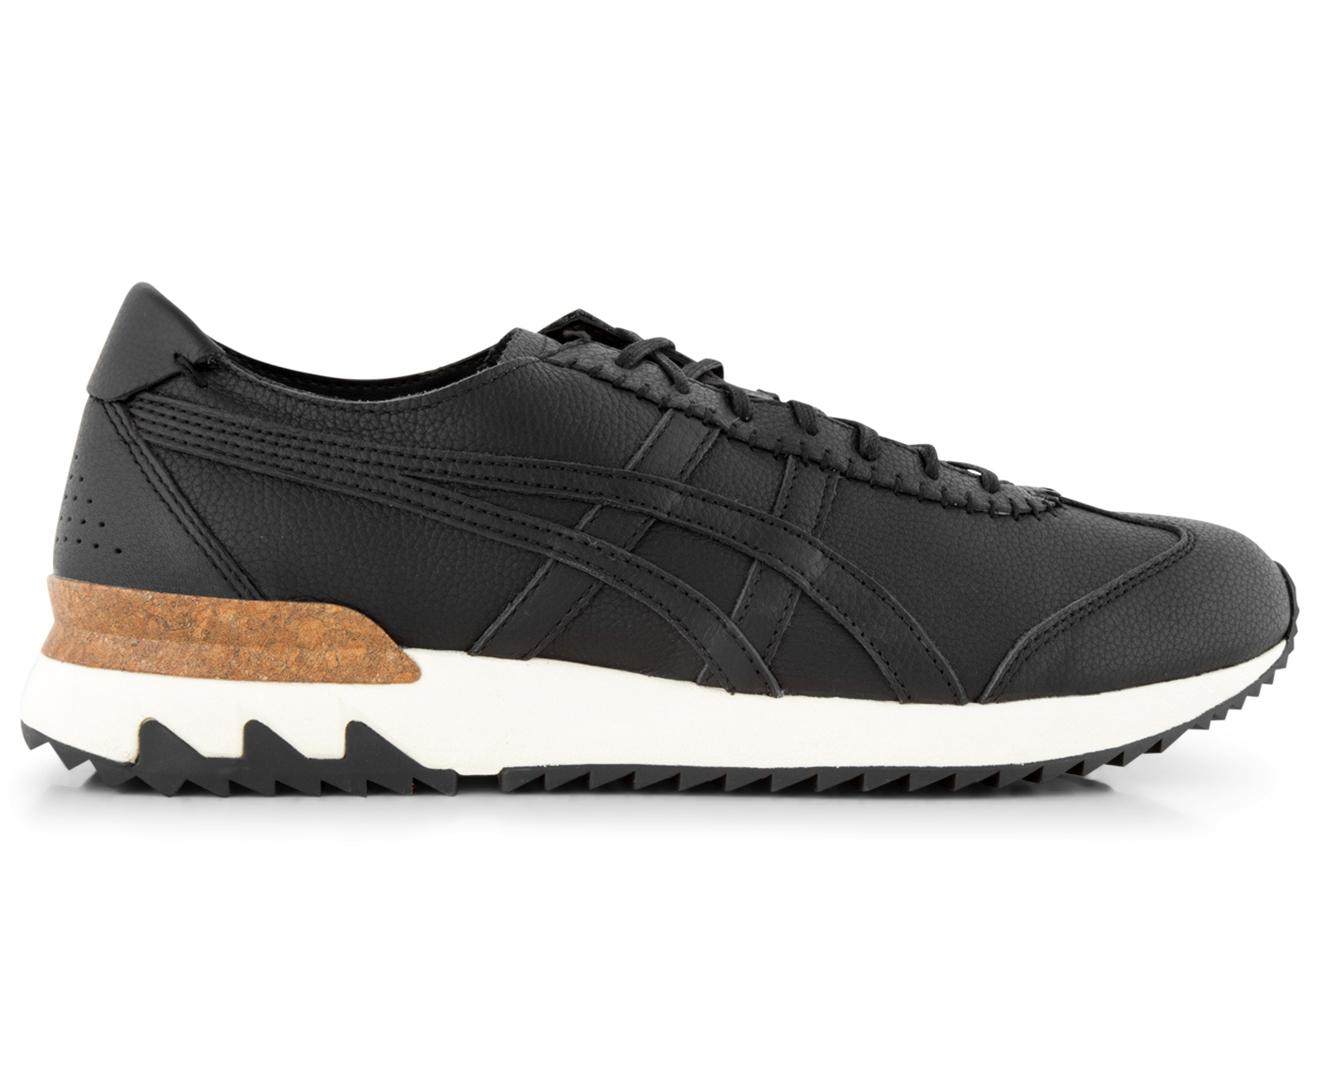 outlet store 069e2 45698 Details about Onitsuka Tiger MHS Shoe - Black